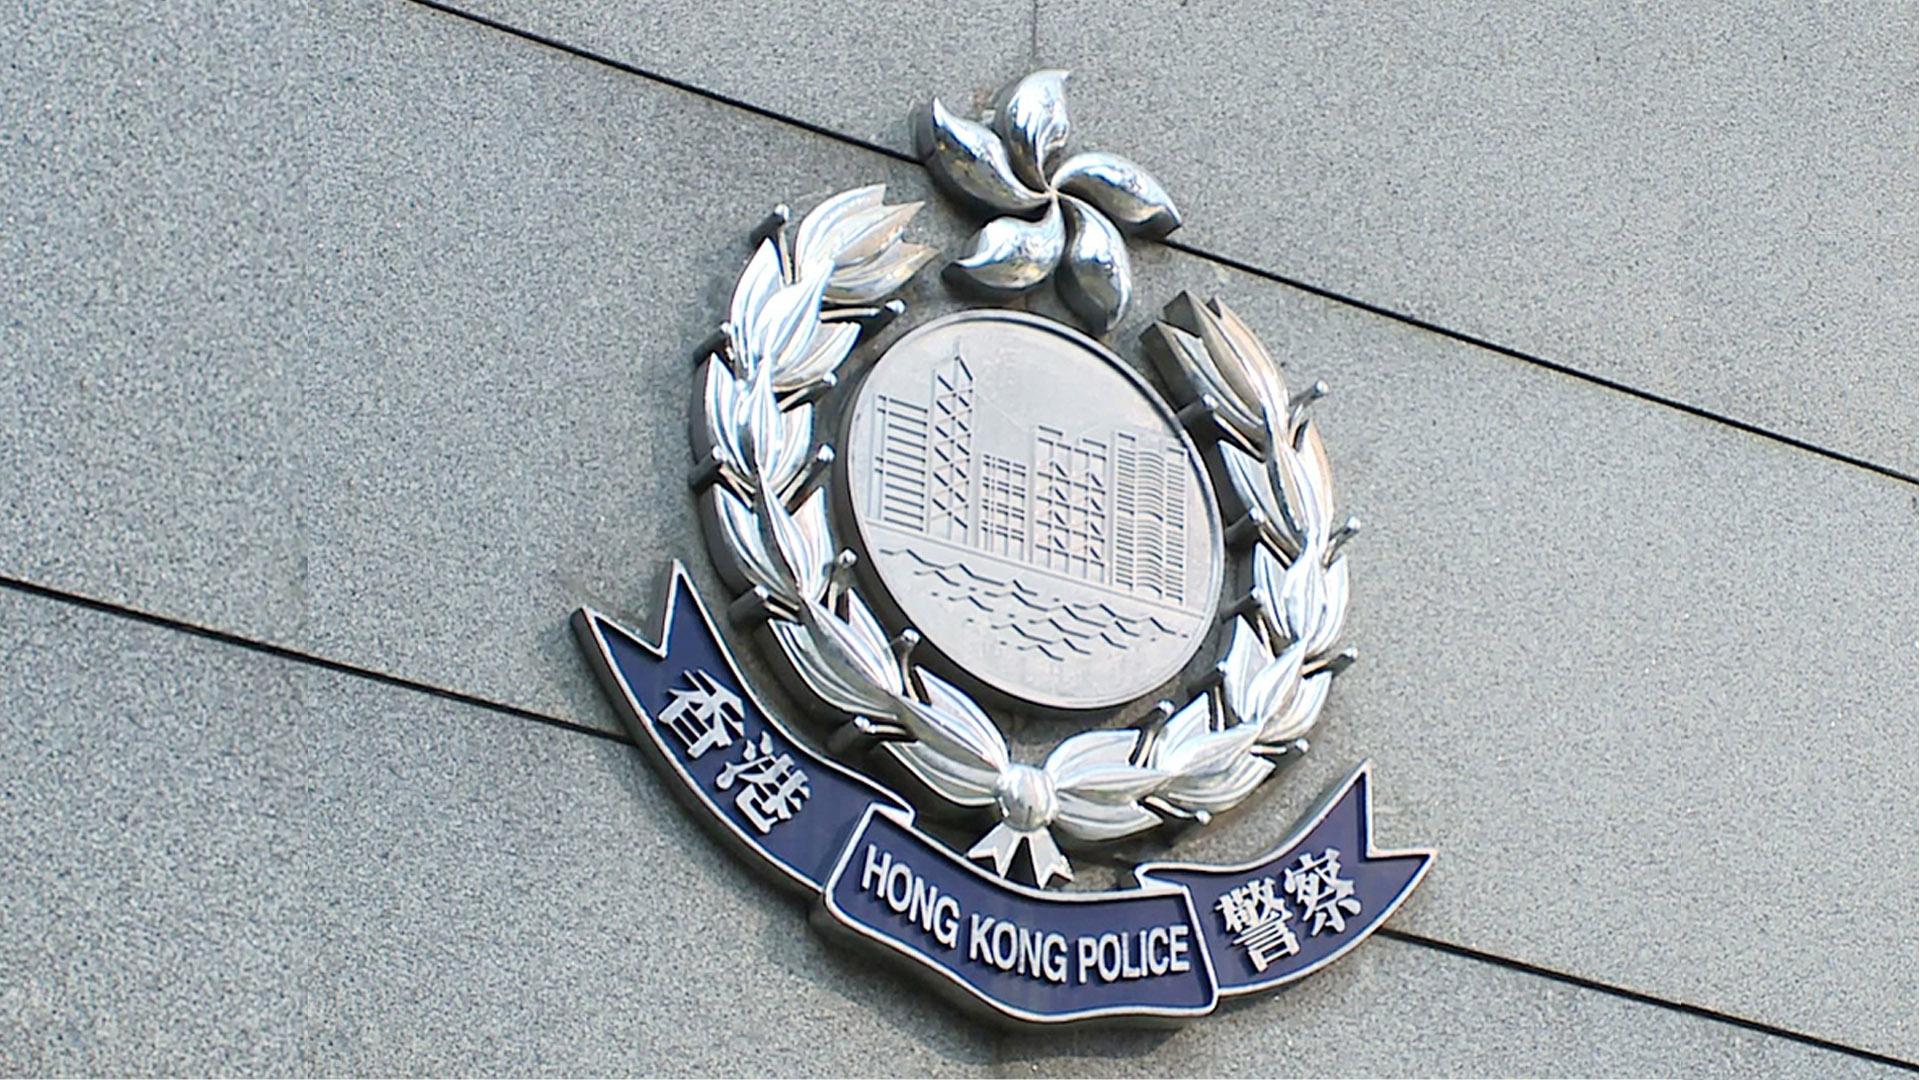 Hong Kong police arrest man suspected of sedition